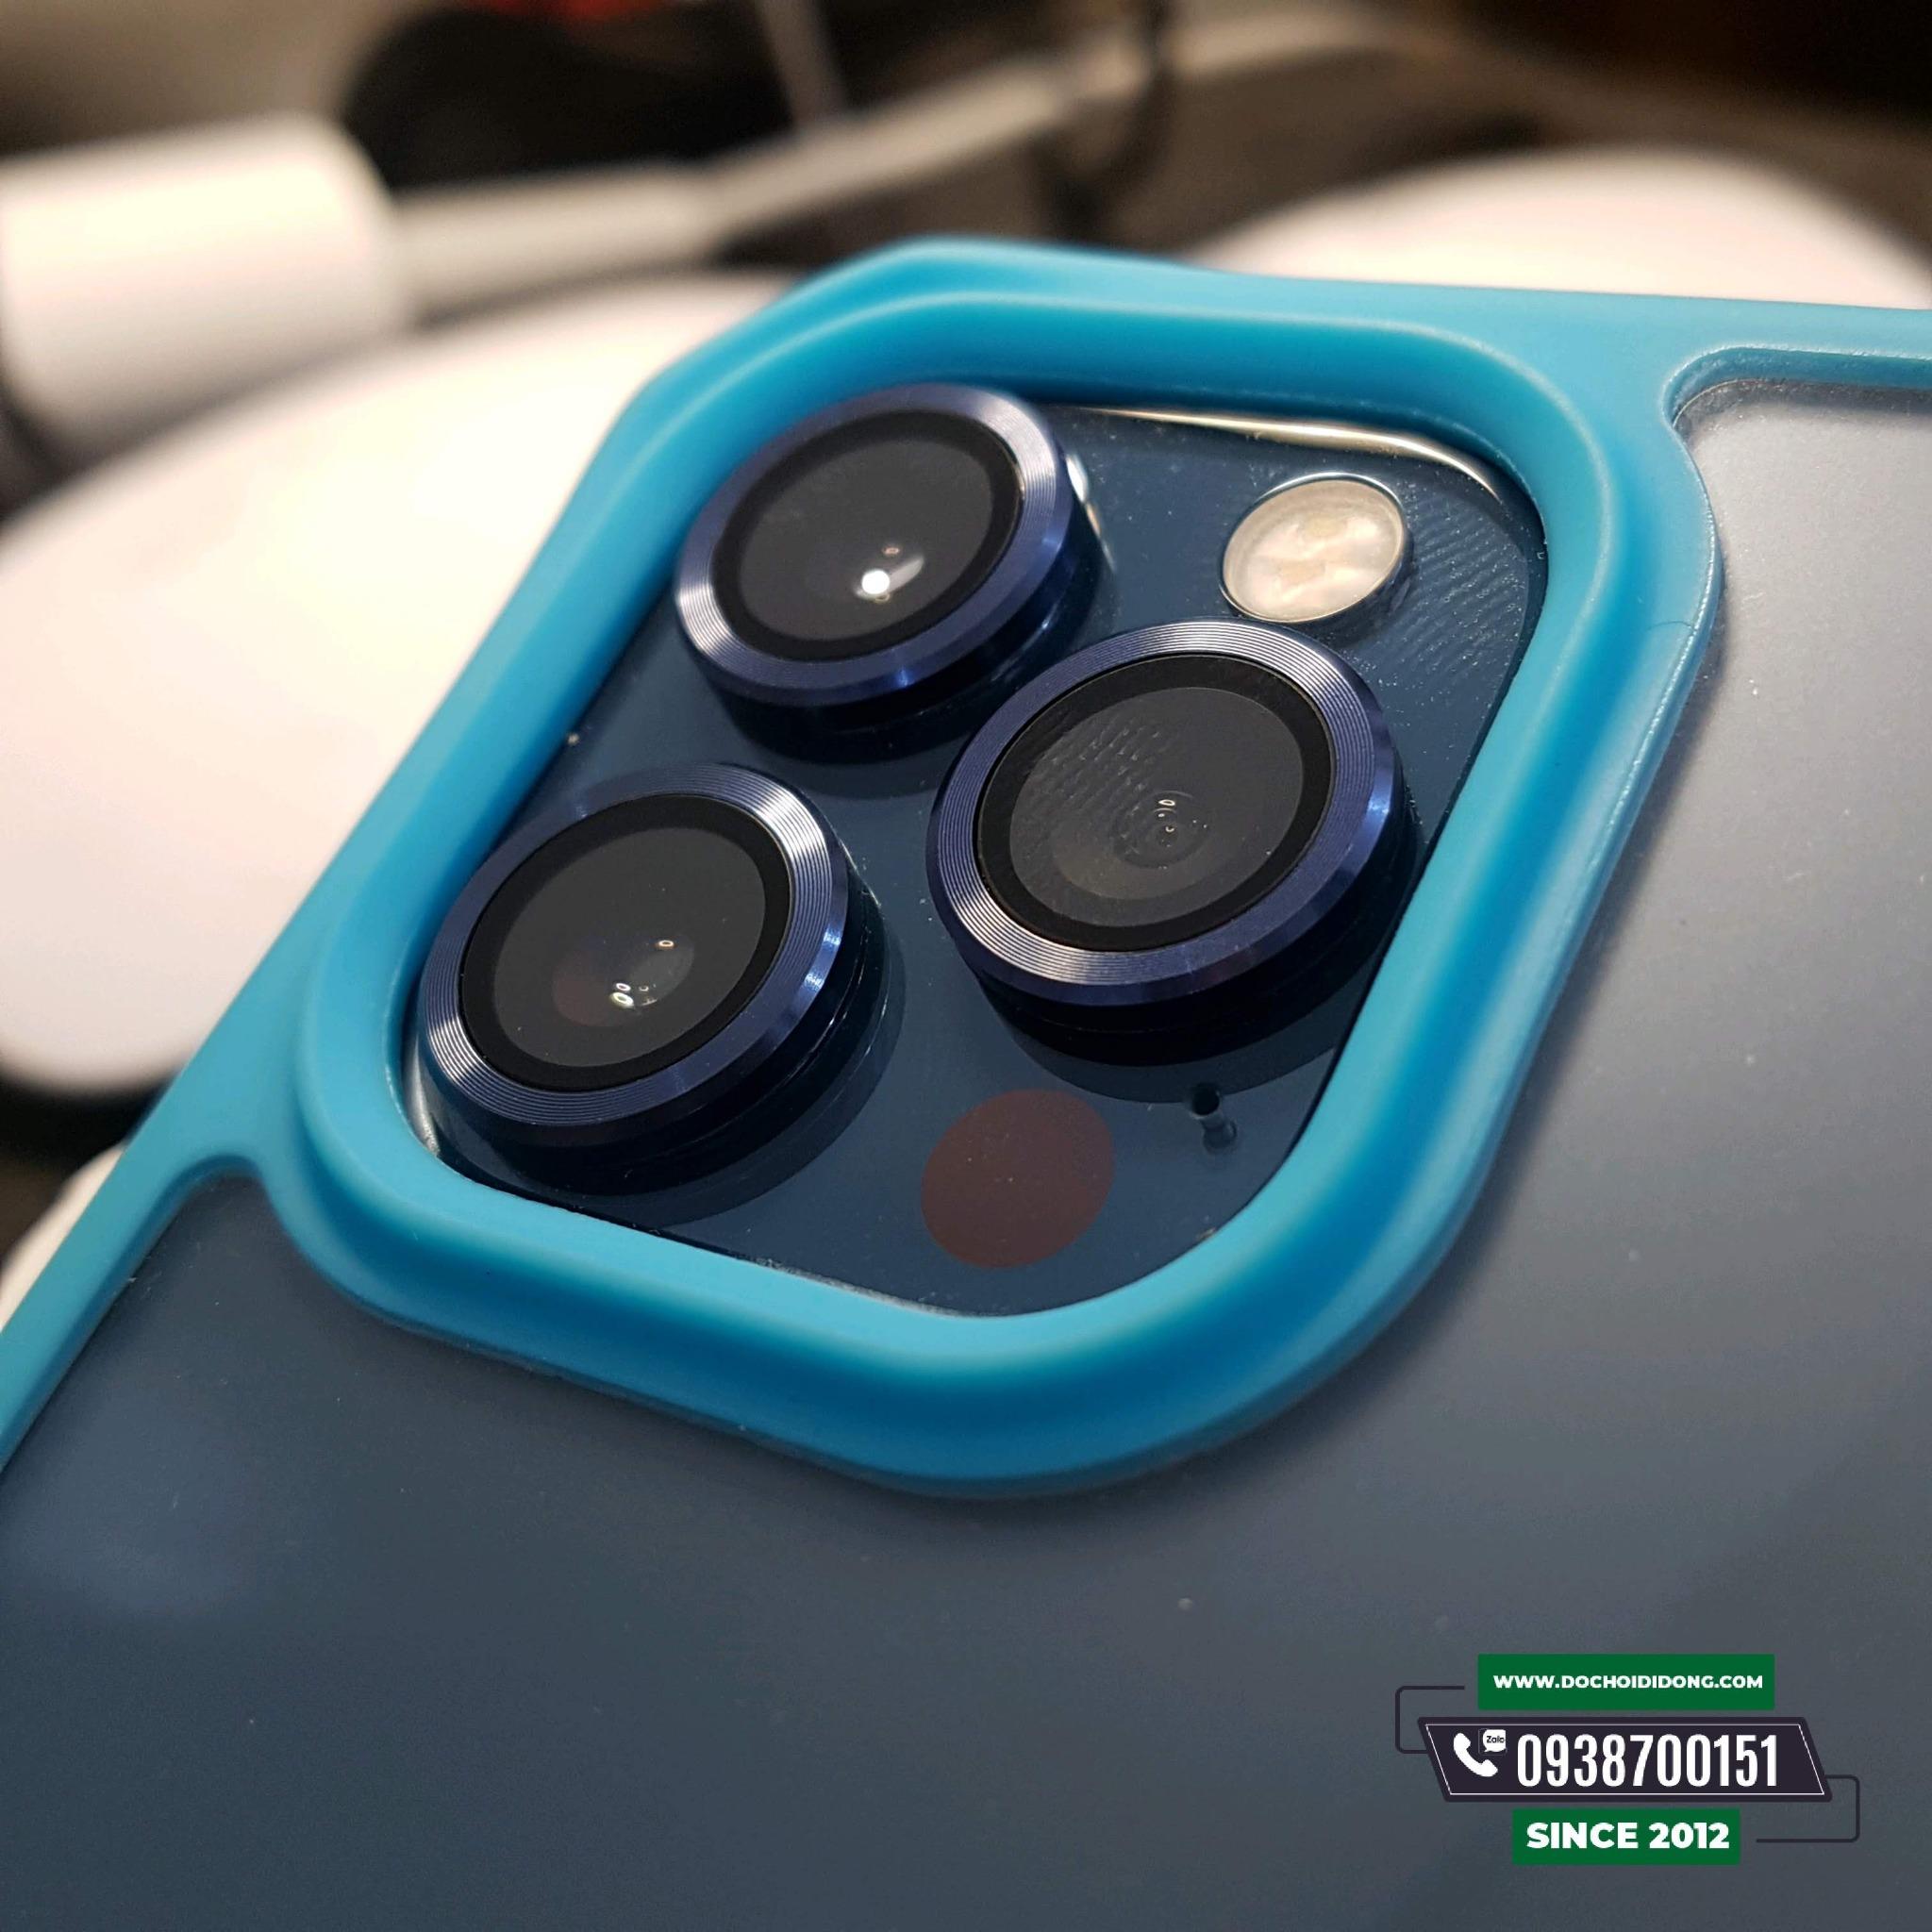 vong-bao-ve-camera-iphone-12-pro-max-mini-cac-thuong-hieu